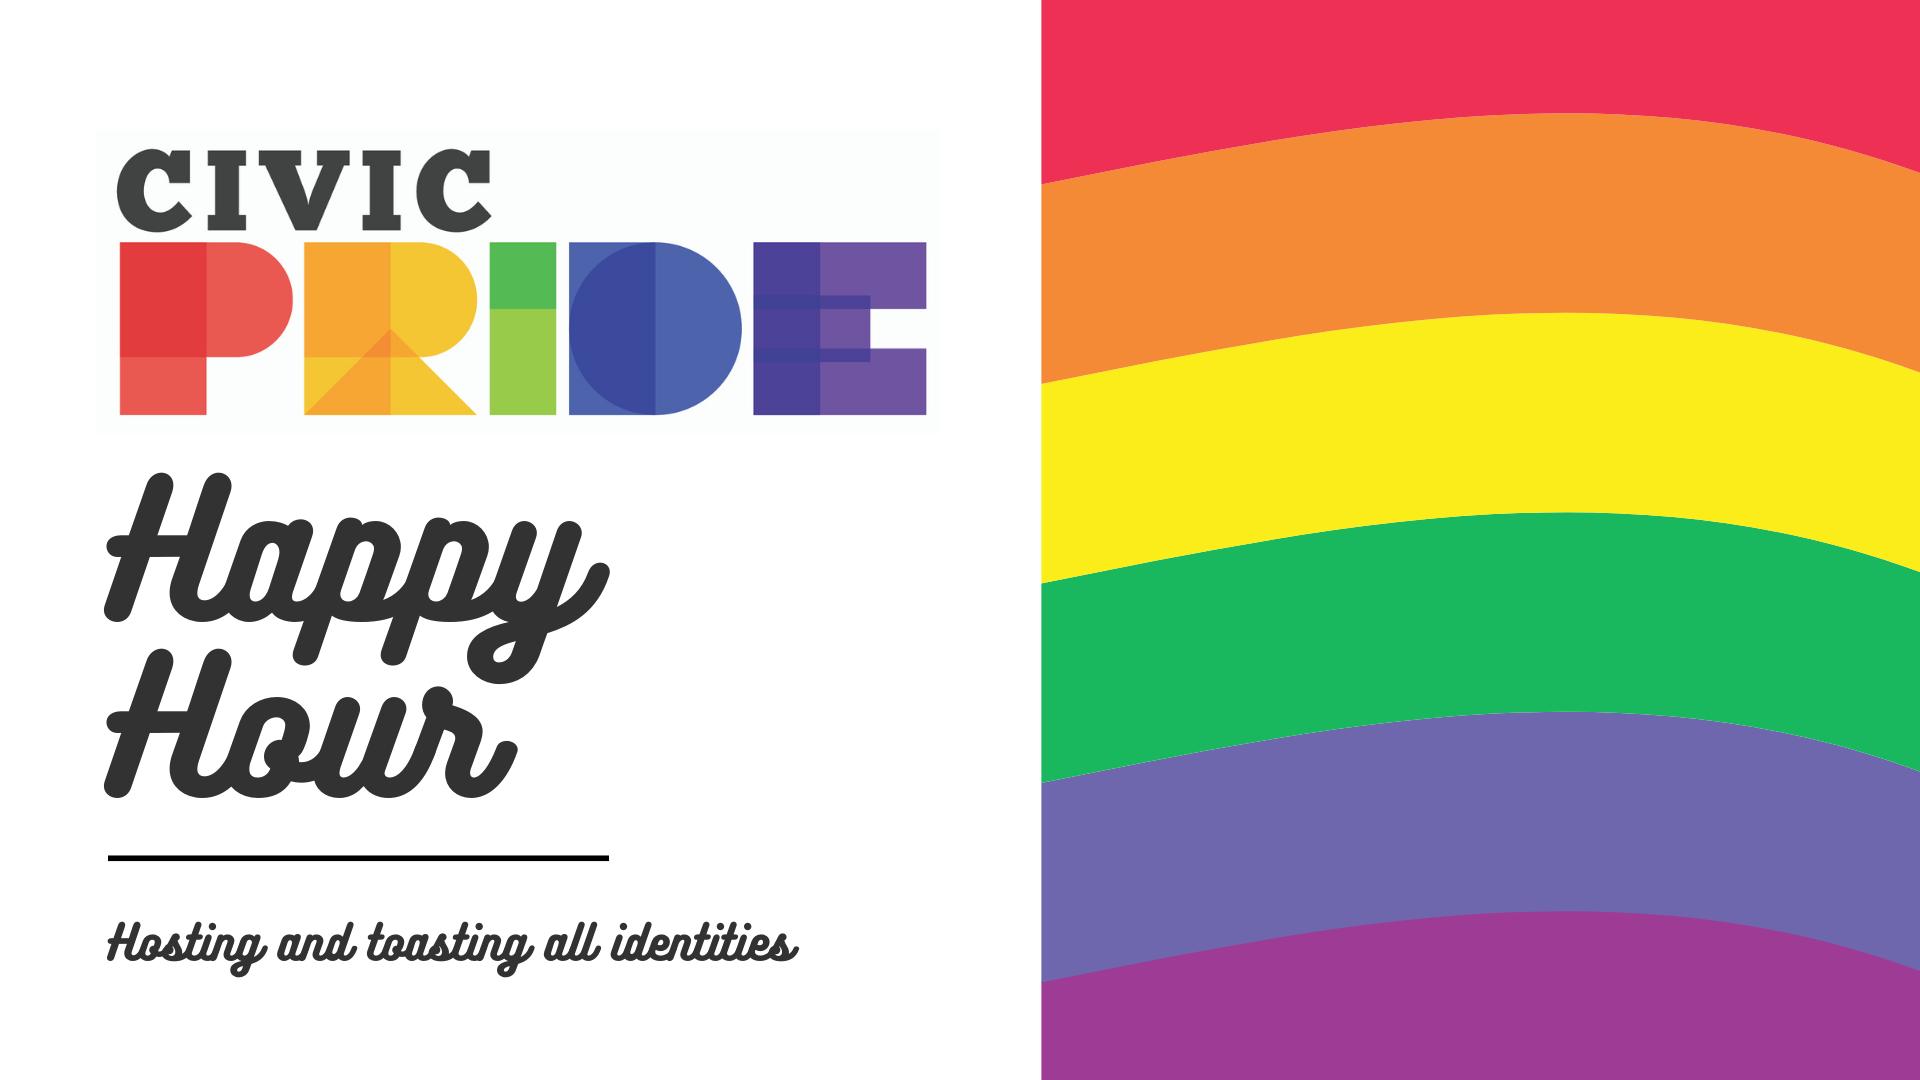 CivicPride Happy Hour Graphic